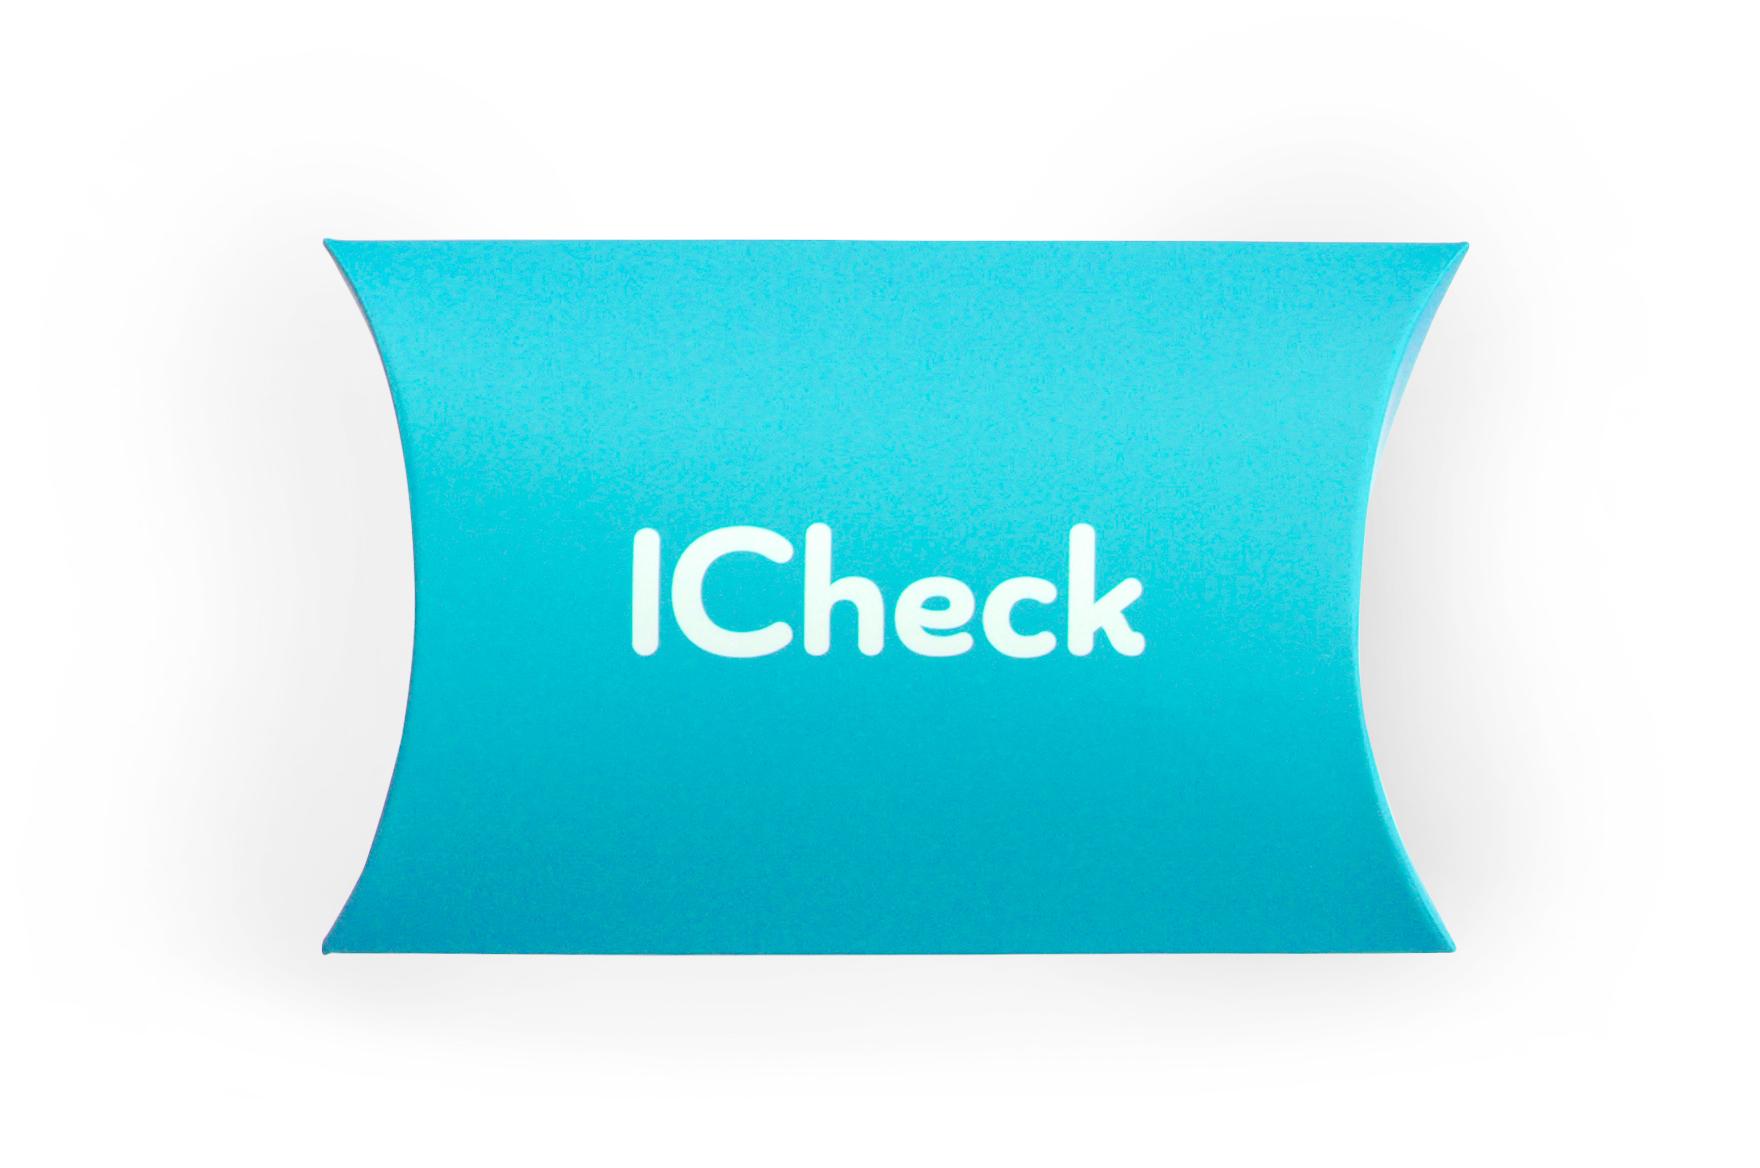 ICheck抗体検査1名分9,980円(税抜)